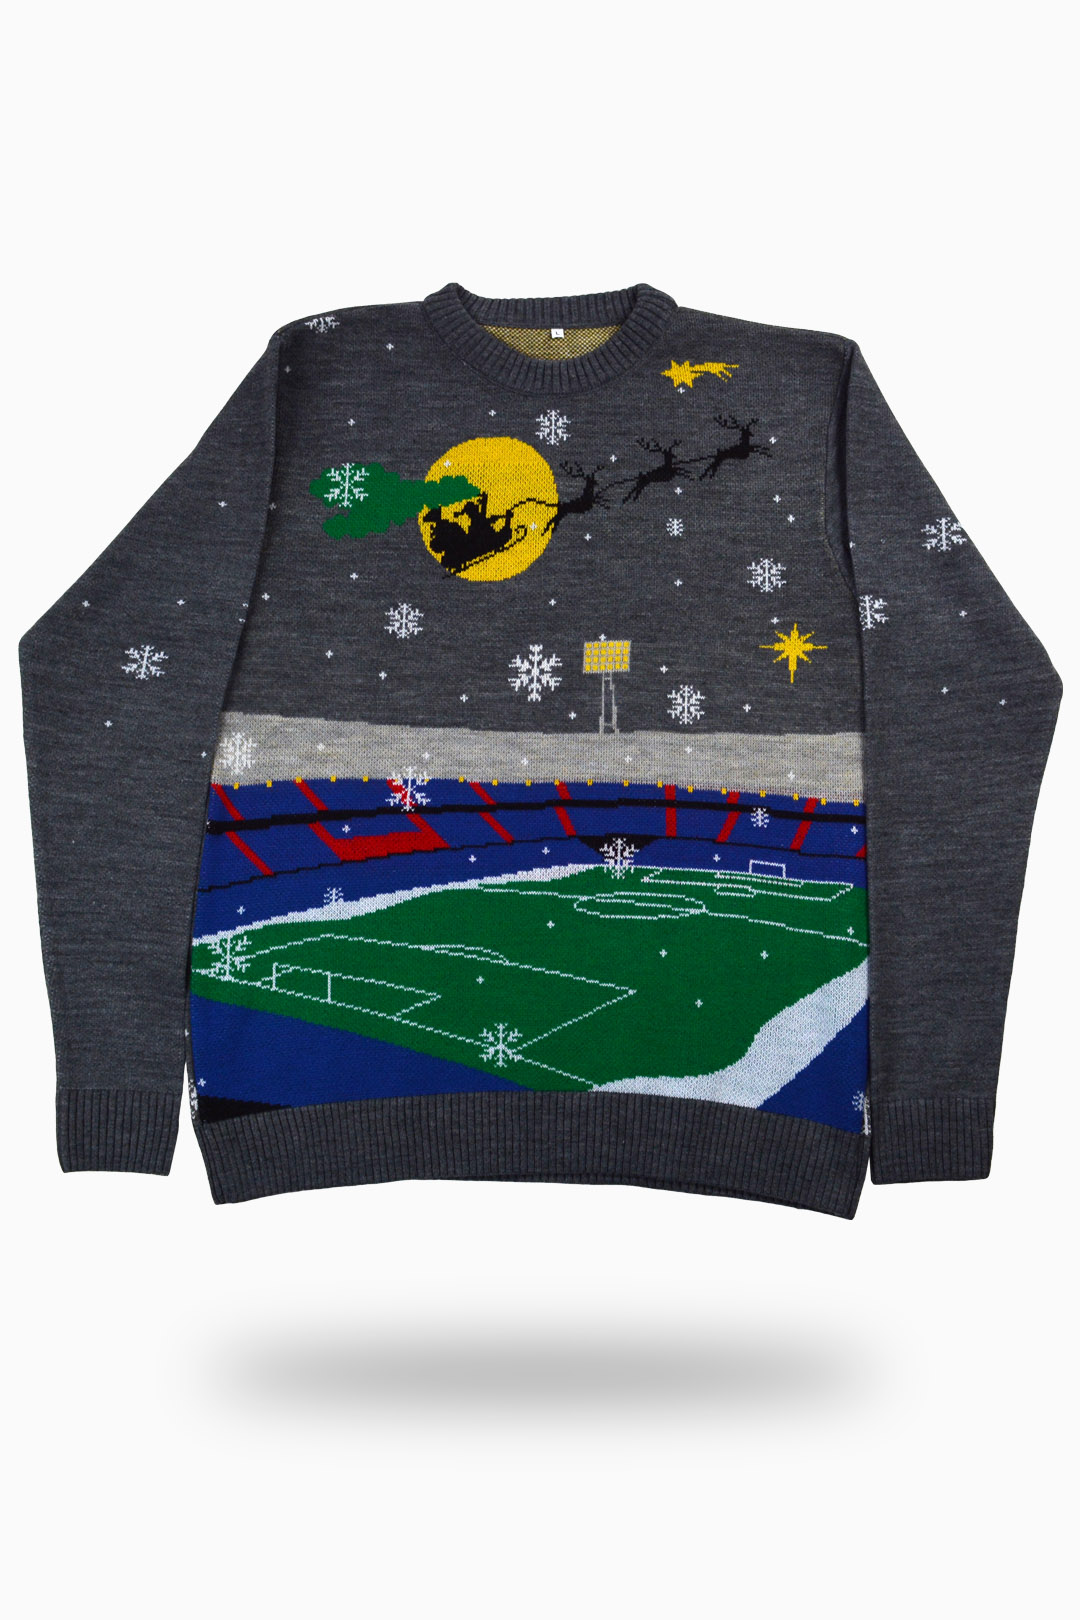 FRFC1908 - Feyenoord Kersttrui - Stadion Feijenoord (De Kuip) - Voorkant